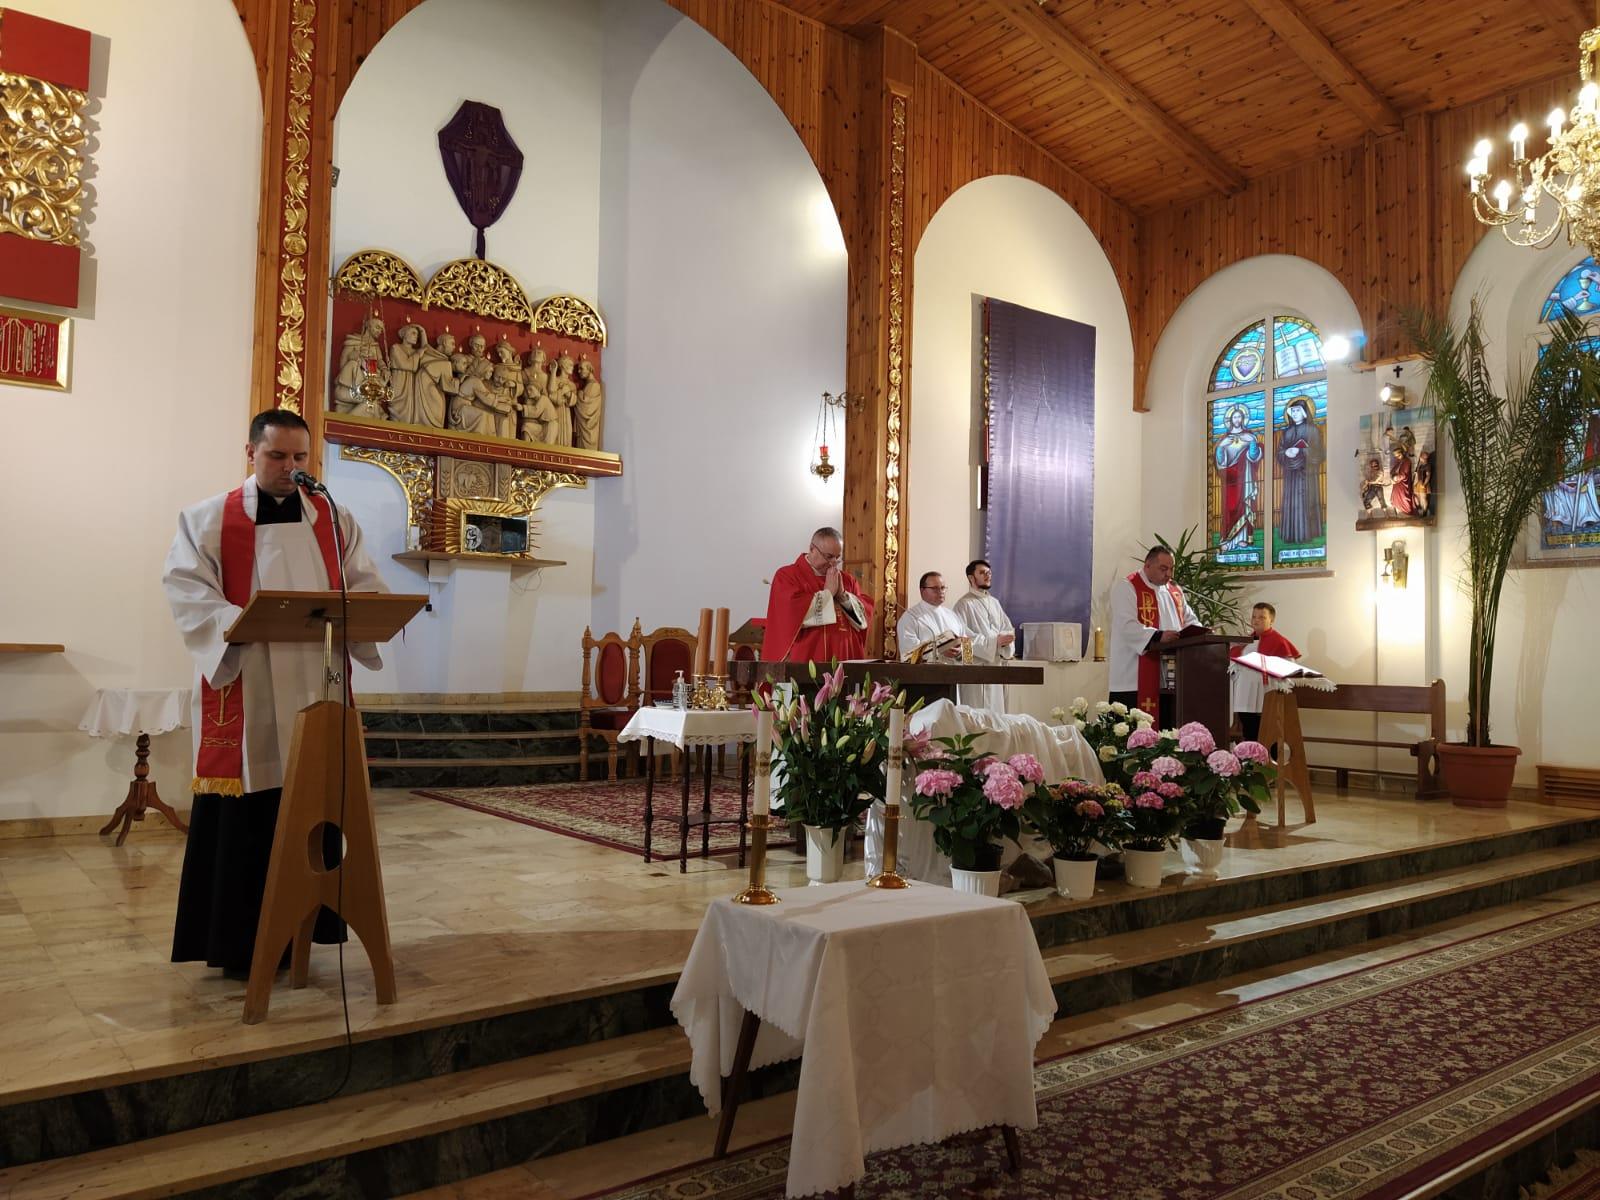 Wielki-Piatek-liturgia-1